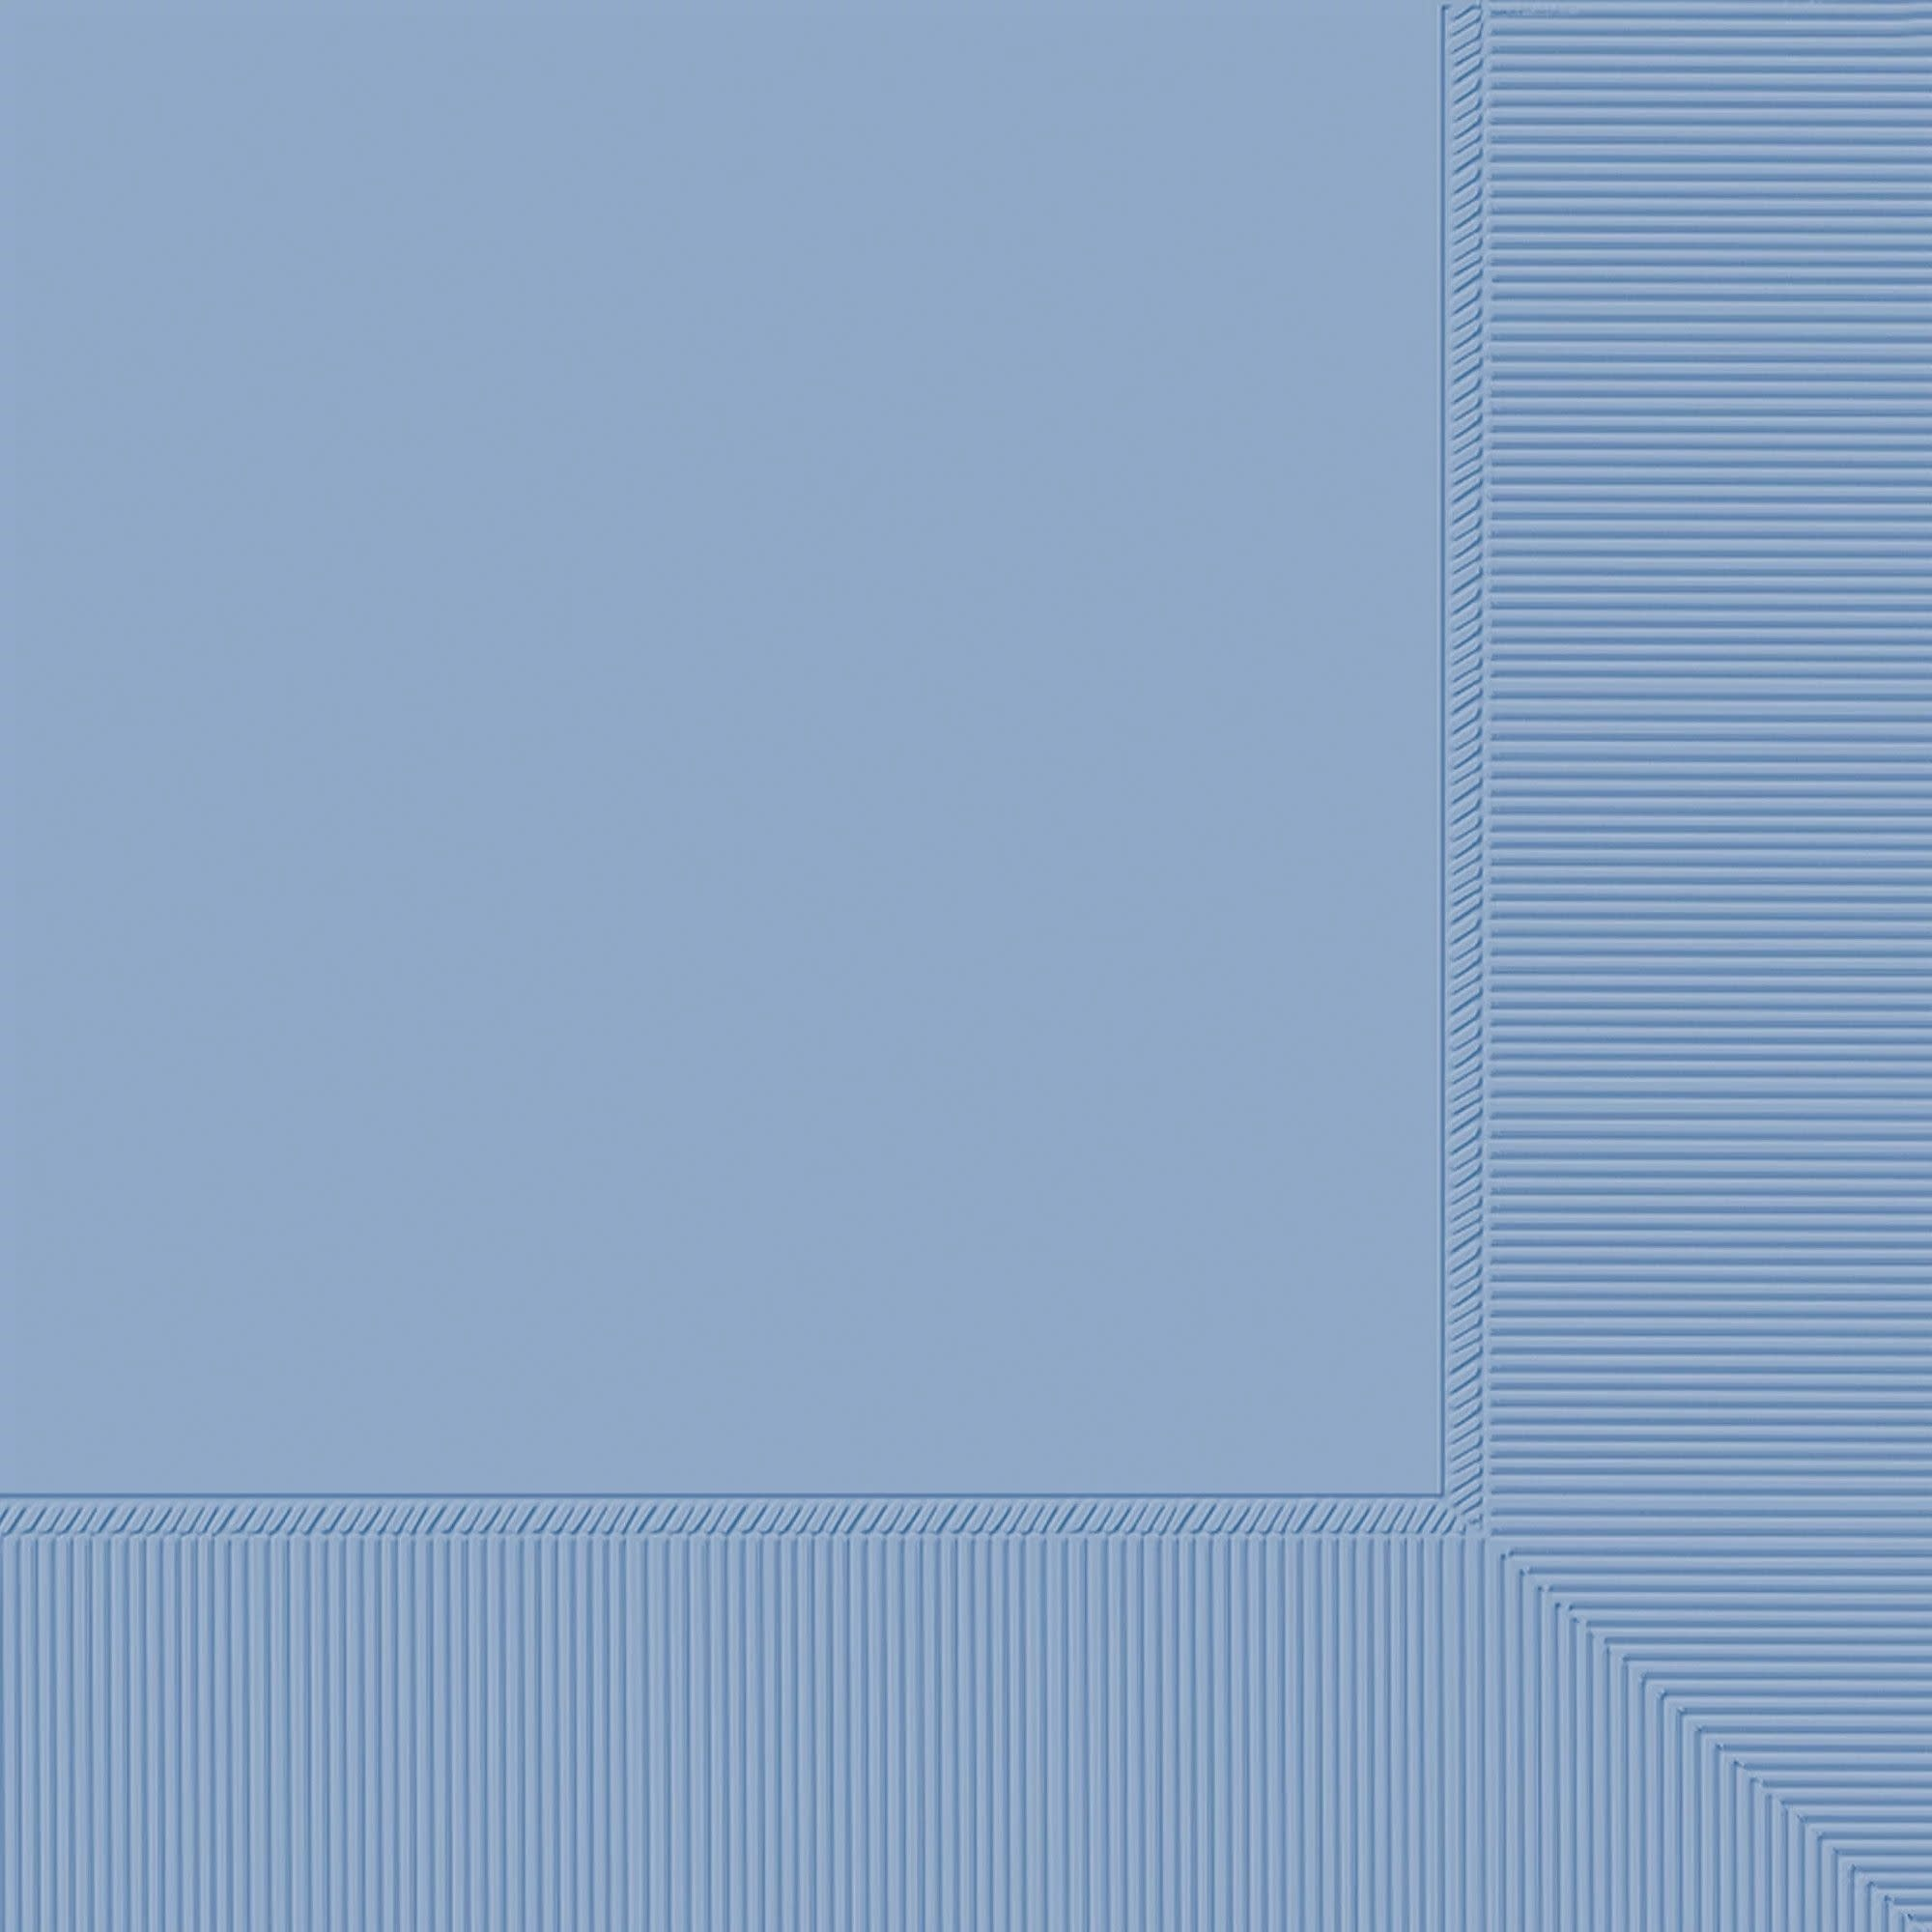 Beverage Napkins, Mid Ct. - Pastel Blue